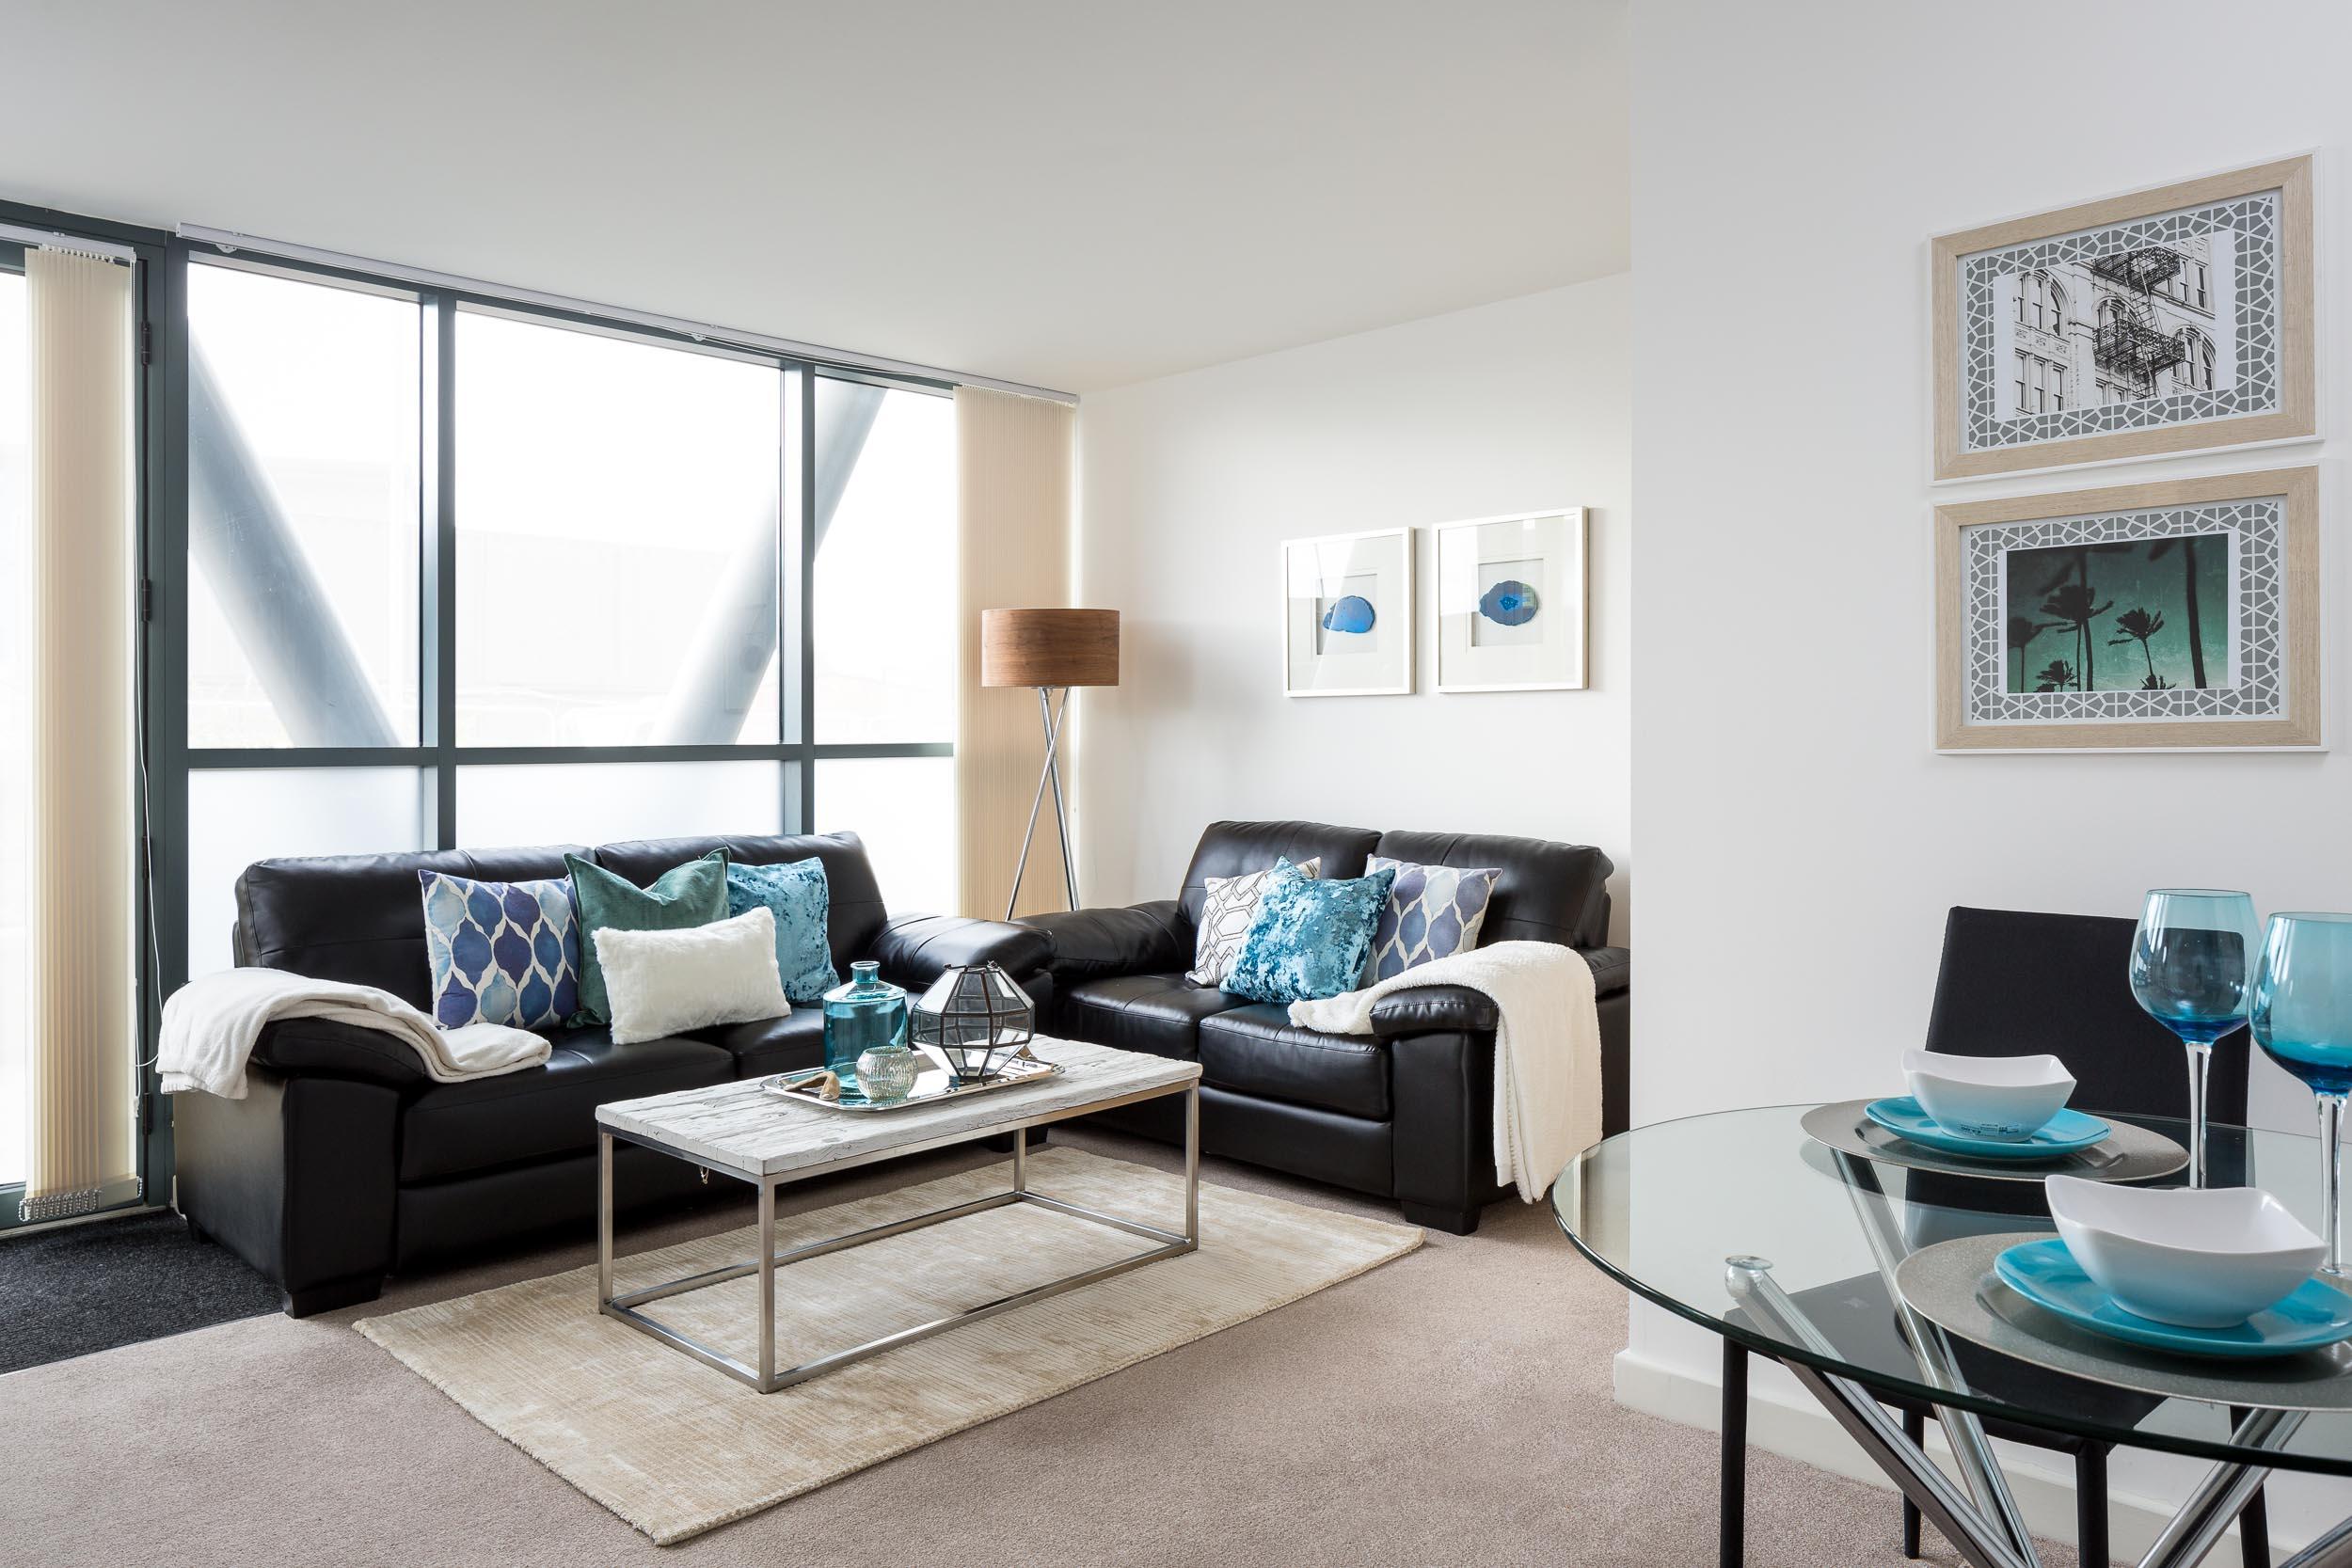 2020 living room lounge interior residential property flat.jpg